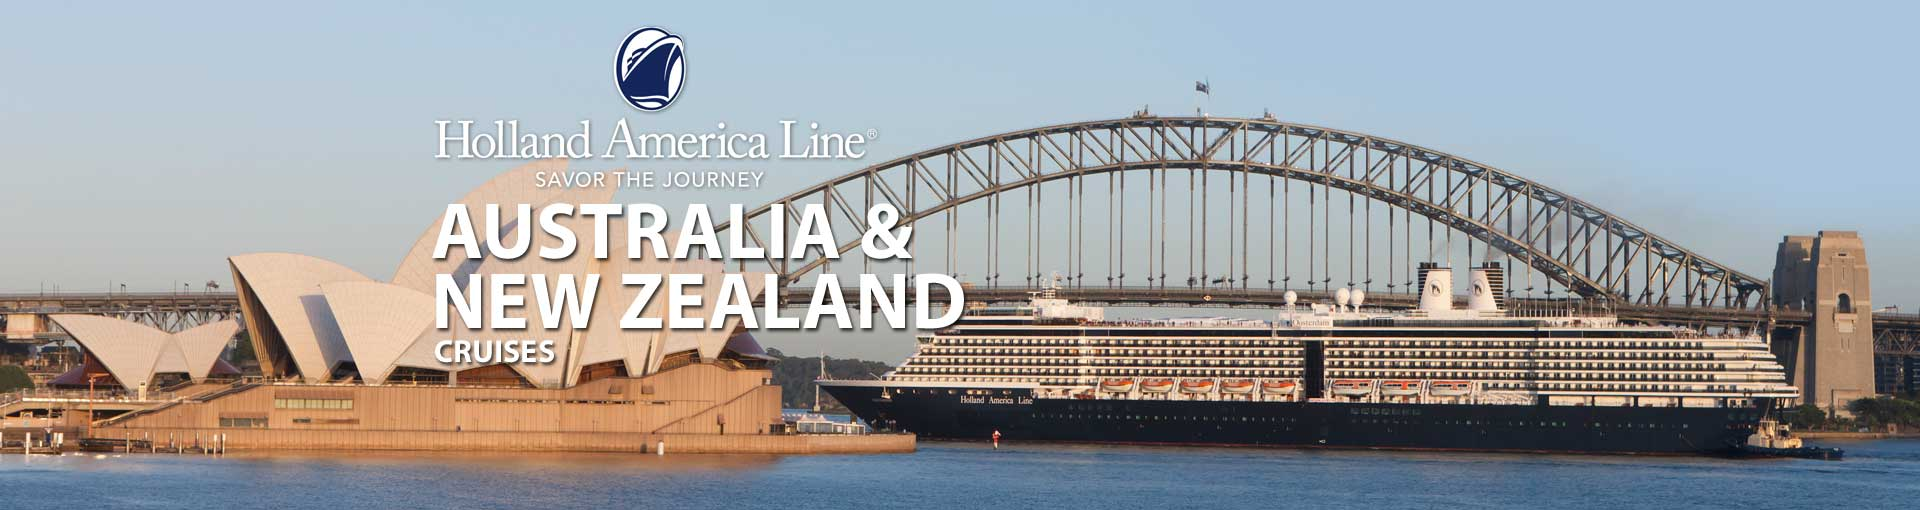 Holland America Australia New Zealand Cruises